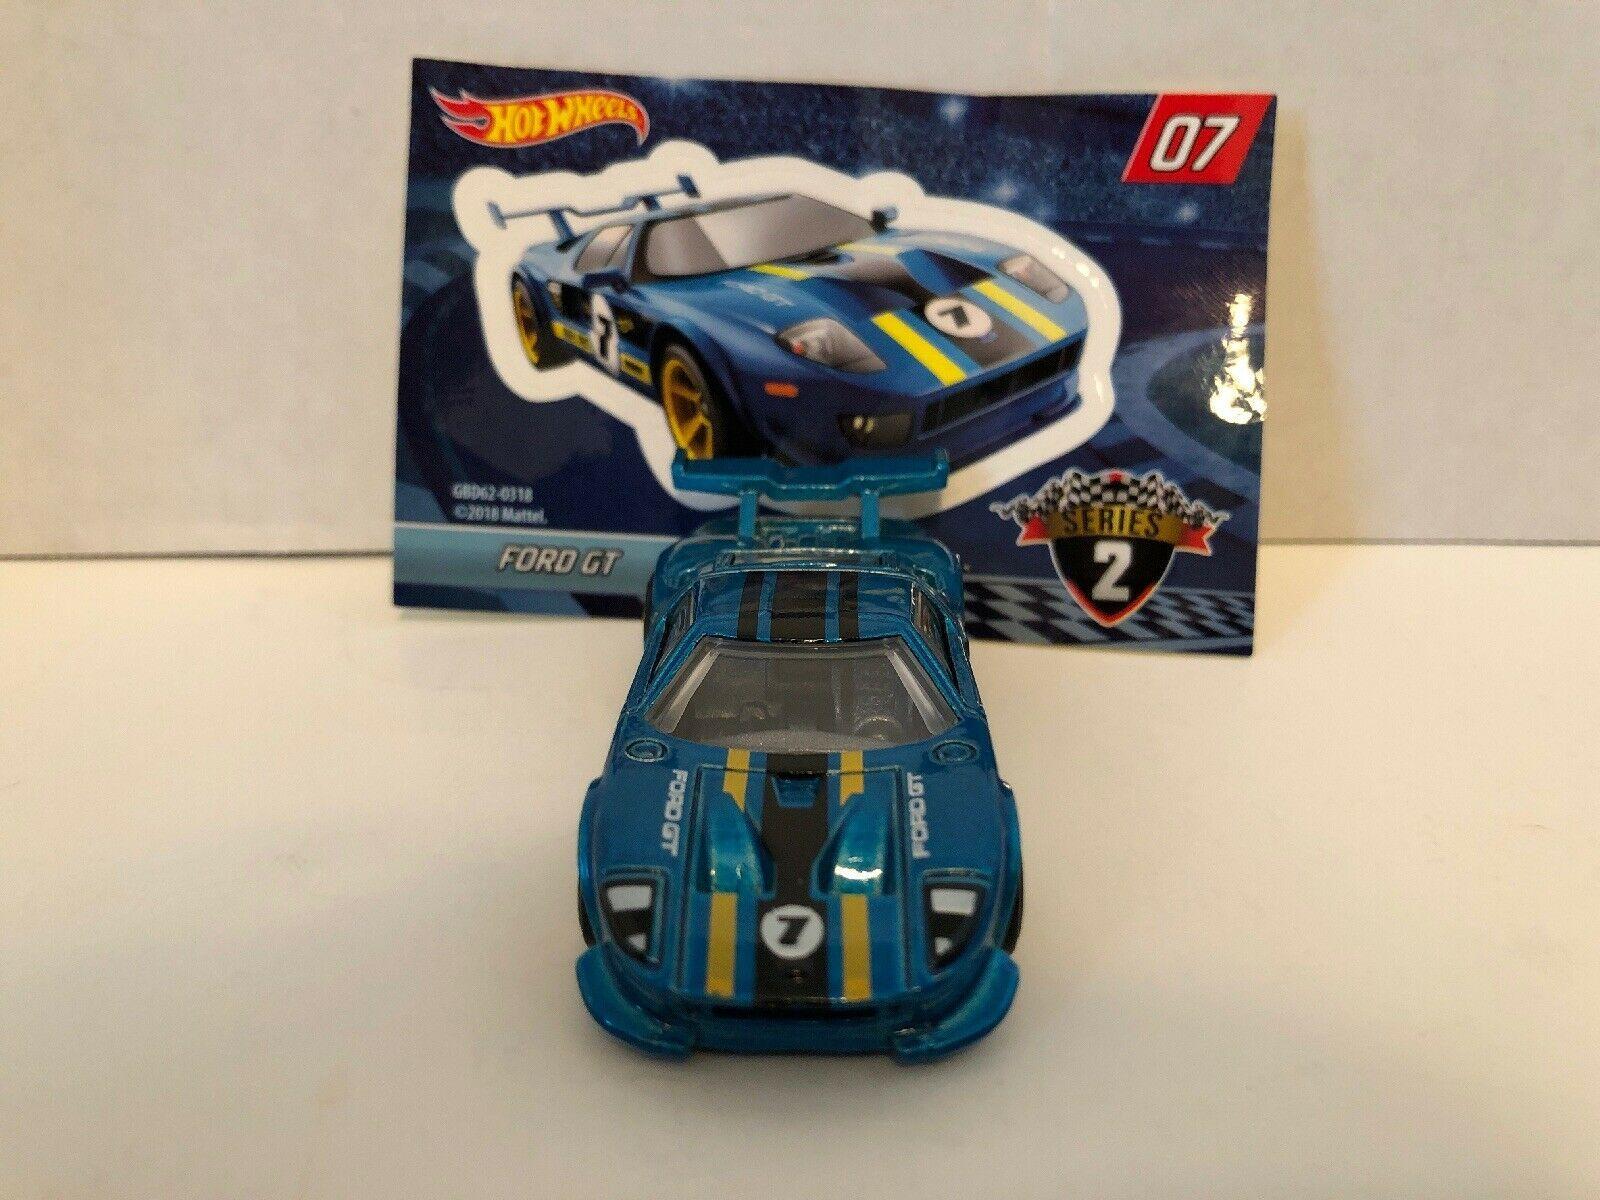 2017 Hot Wheels Rlc Ford Gt Race Prototype Super Rare Hotwheels